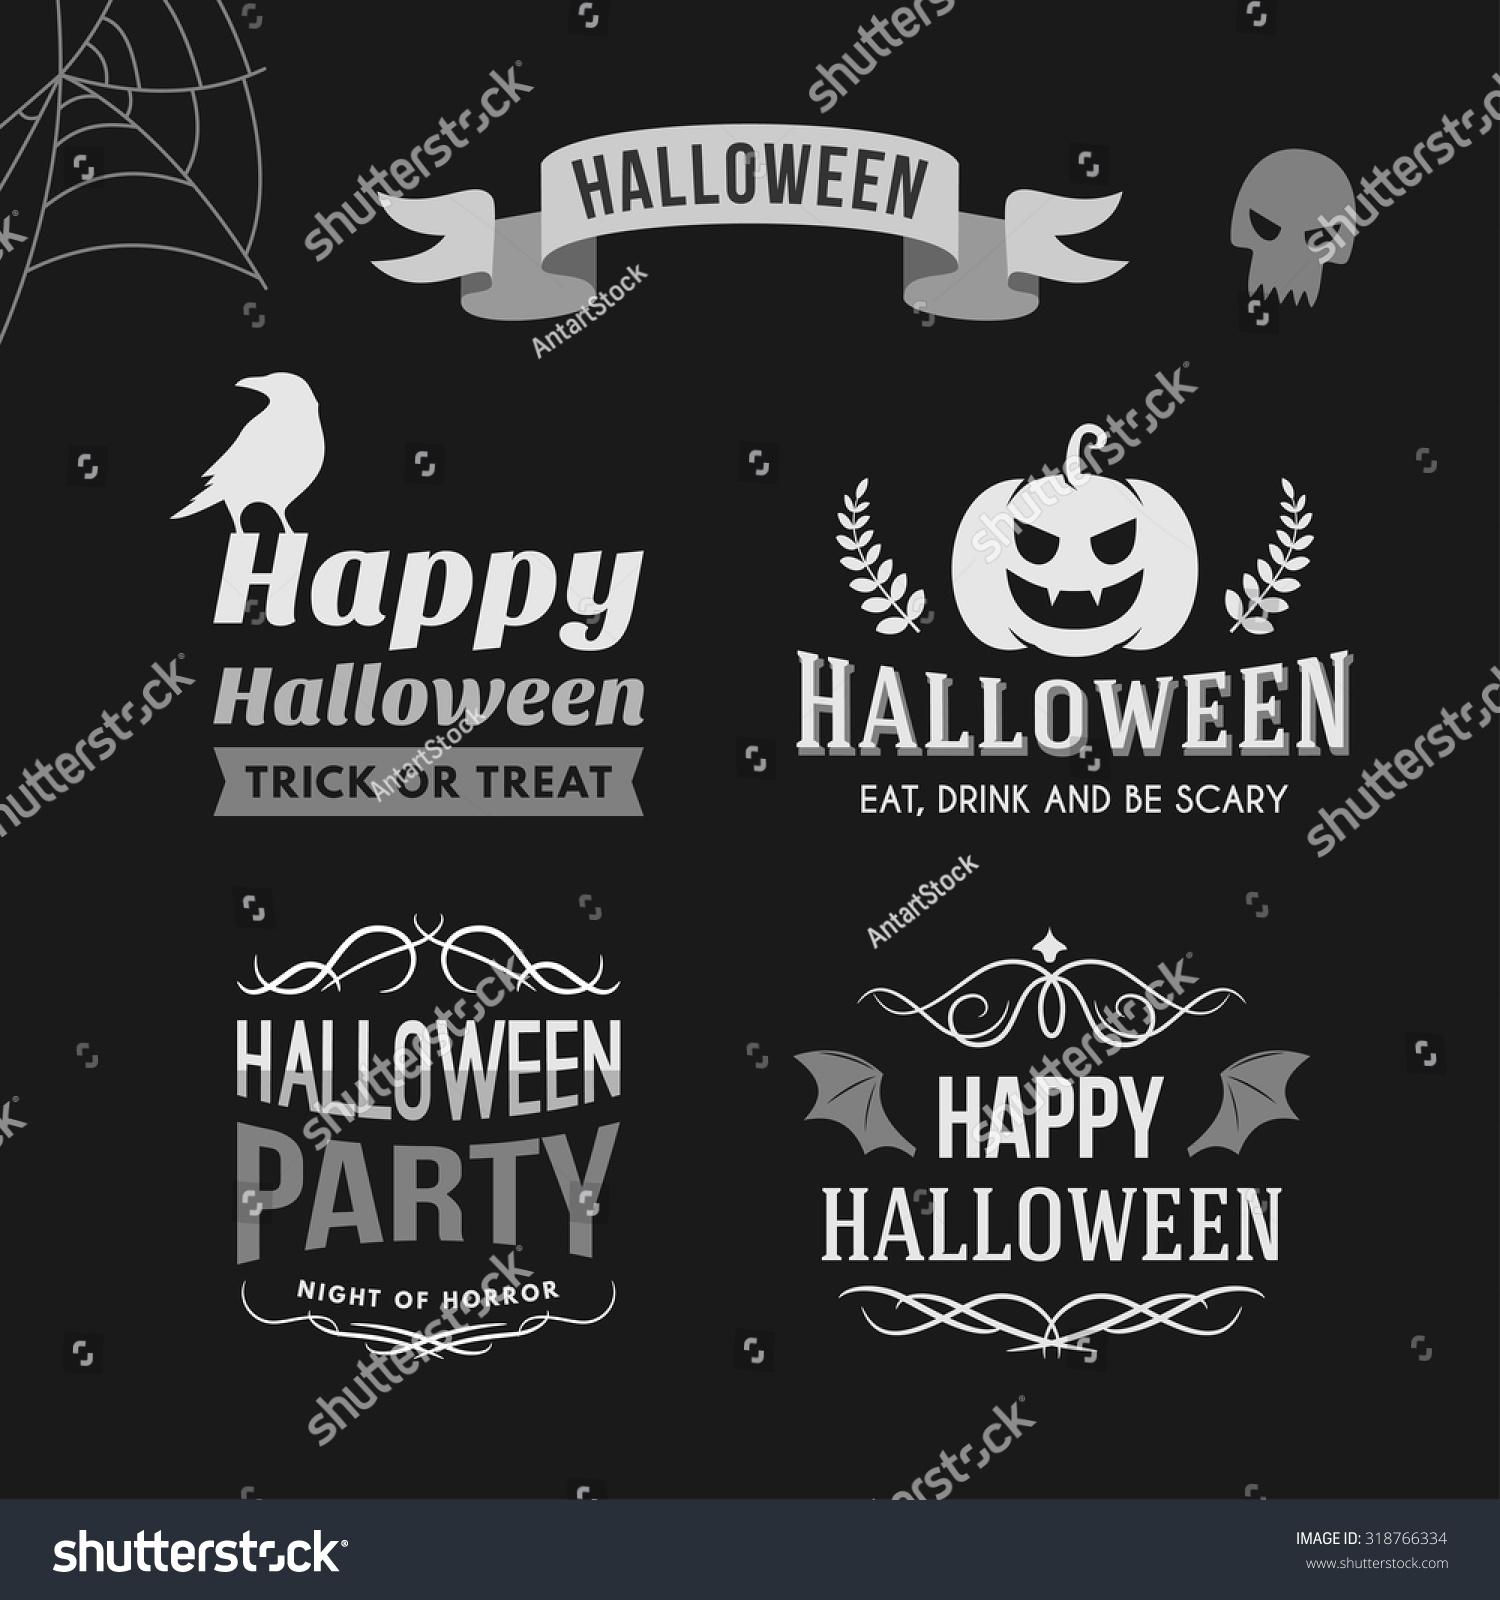 Retro Vintage Halloween Clip Art.Set Retro Vintage Halloween Badges Black Stock Vector Royalty Free